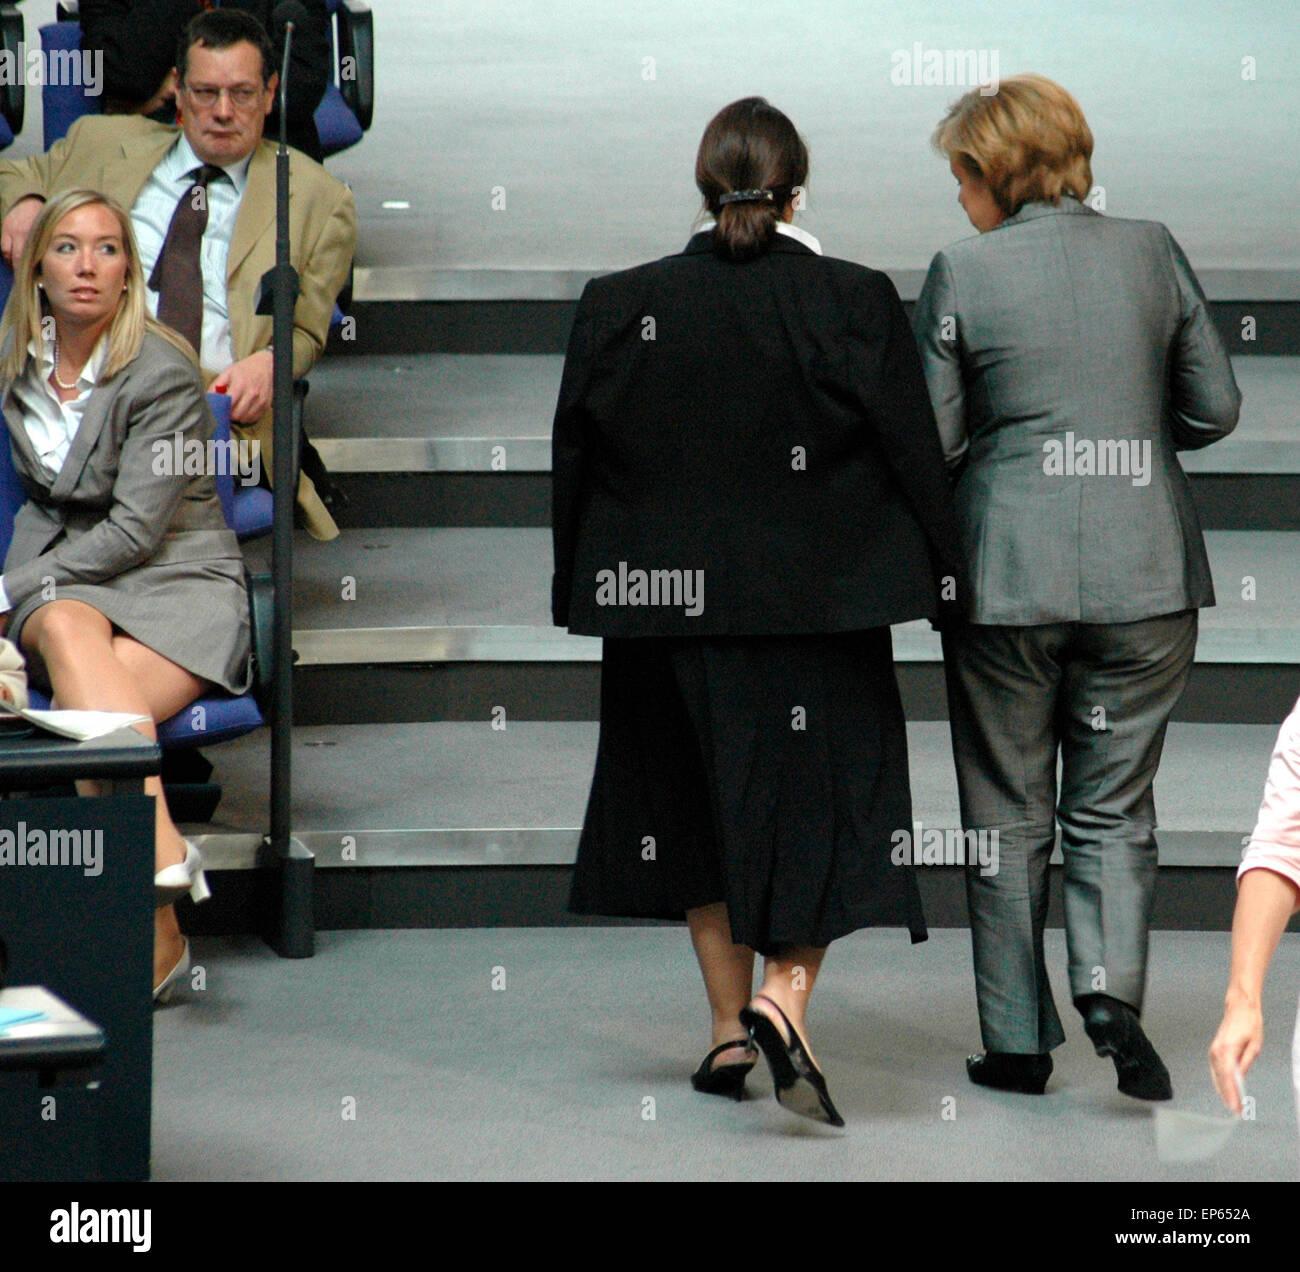 Angela Merkel Bundeskanzlerin u.a. - Sitzung Bundestag im am 29. Juni 2006, Reichstagsgebaeude, Berlín Tiergarten. Foto de stock